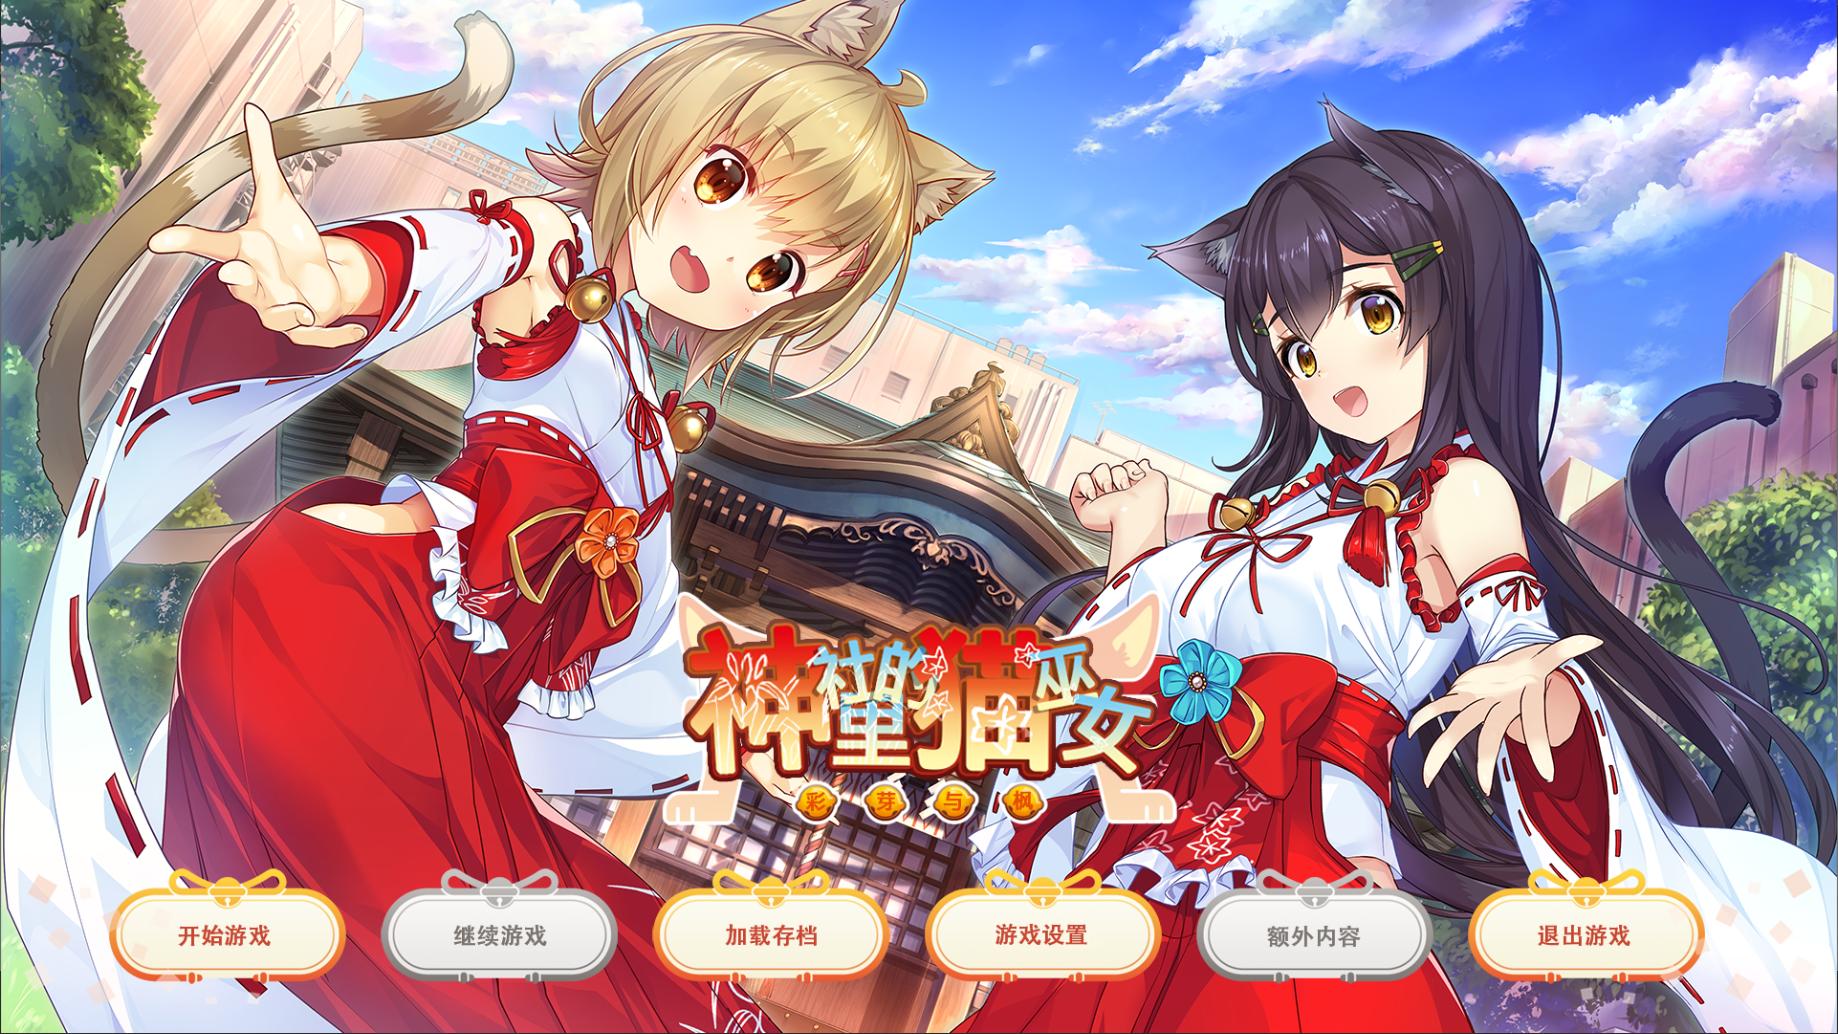 【PC/ADV/汉化】神社里的猫巫女 (Nekomiko) [OD] 755M (附全CG存档)